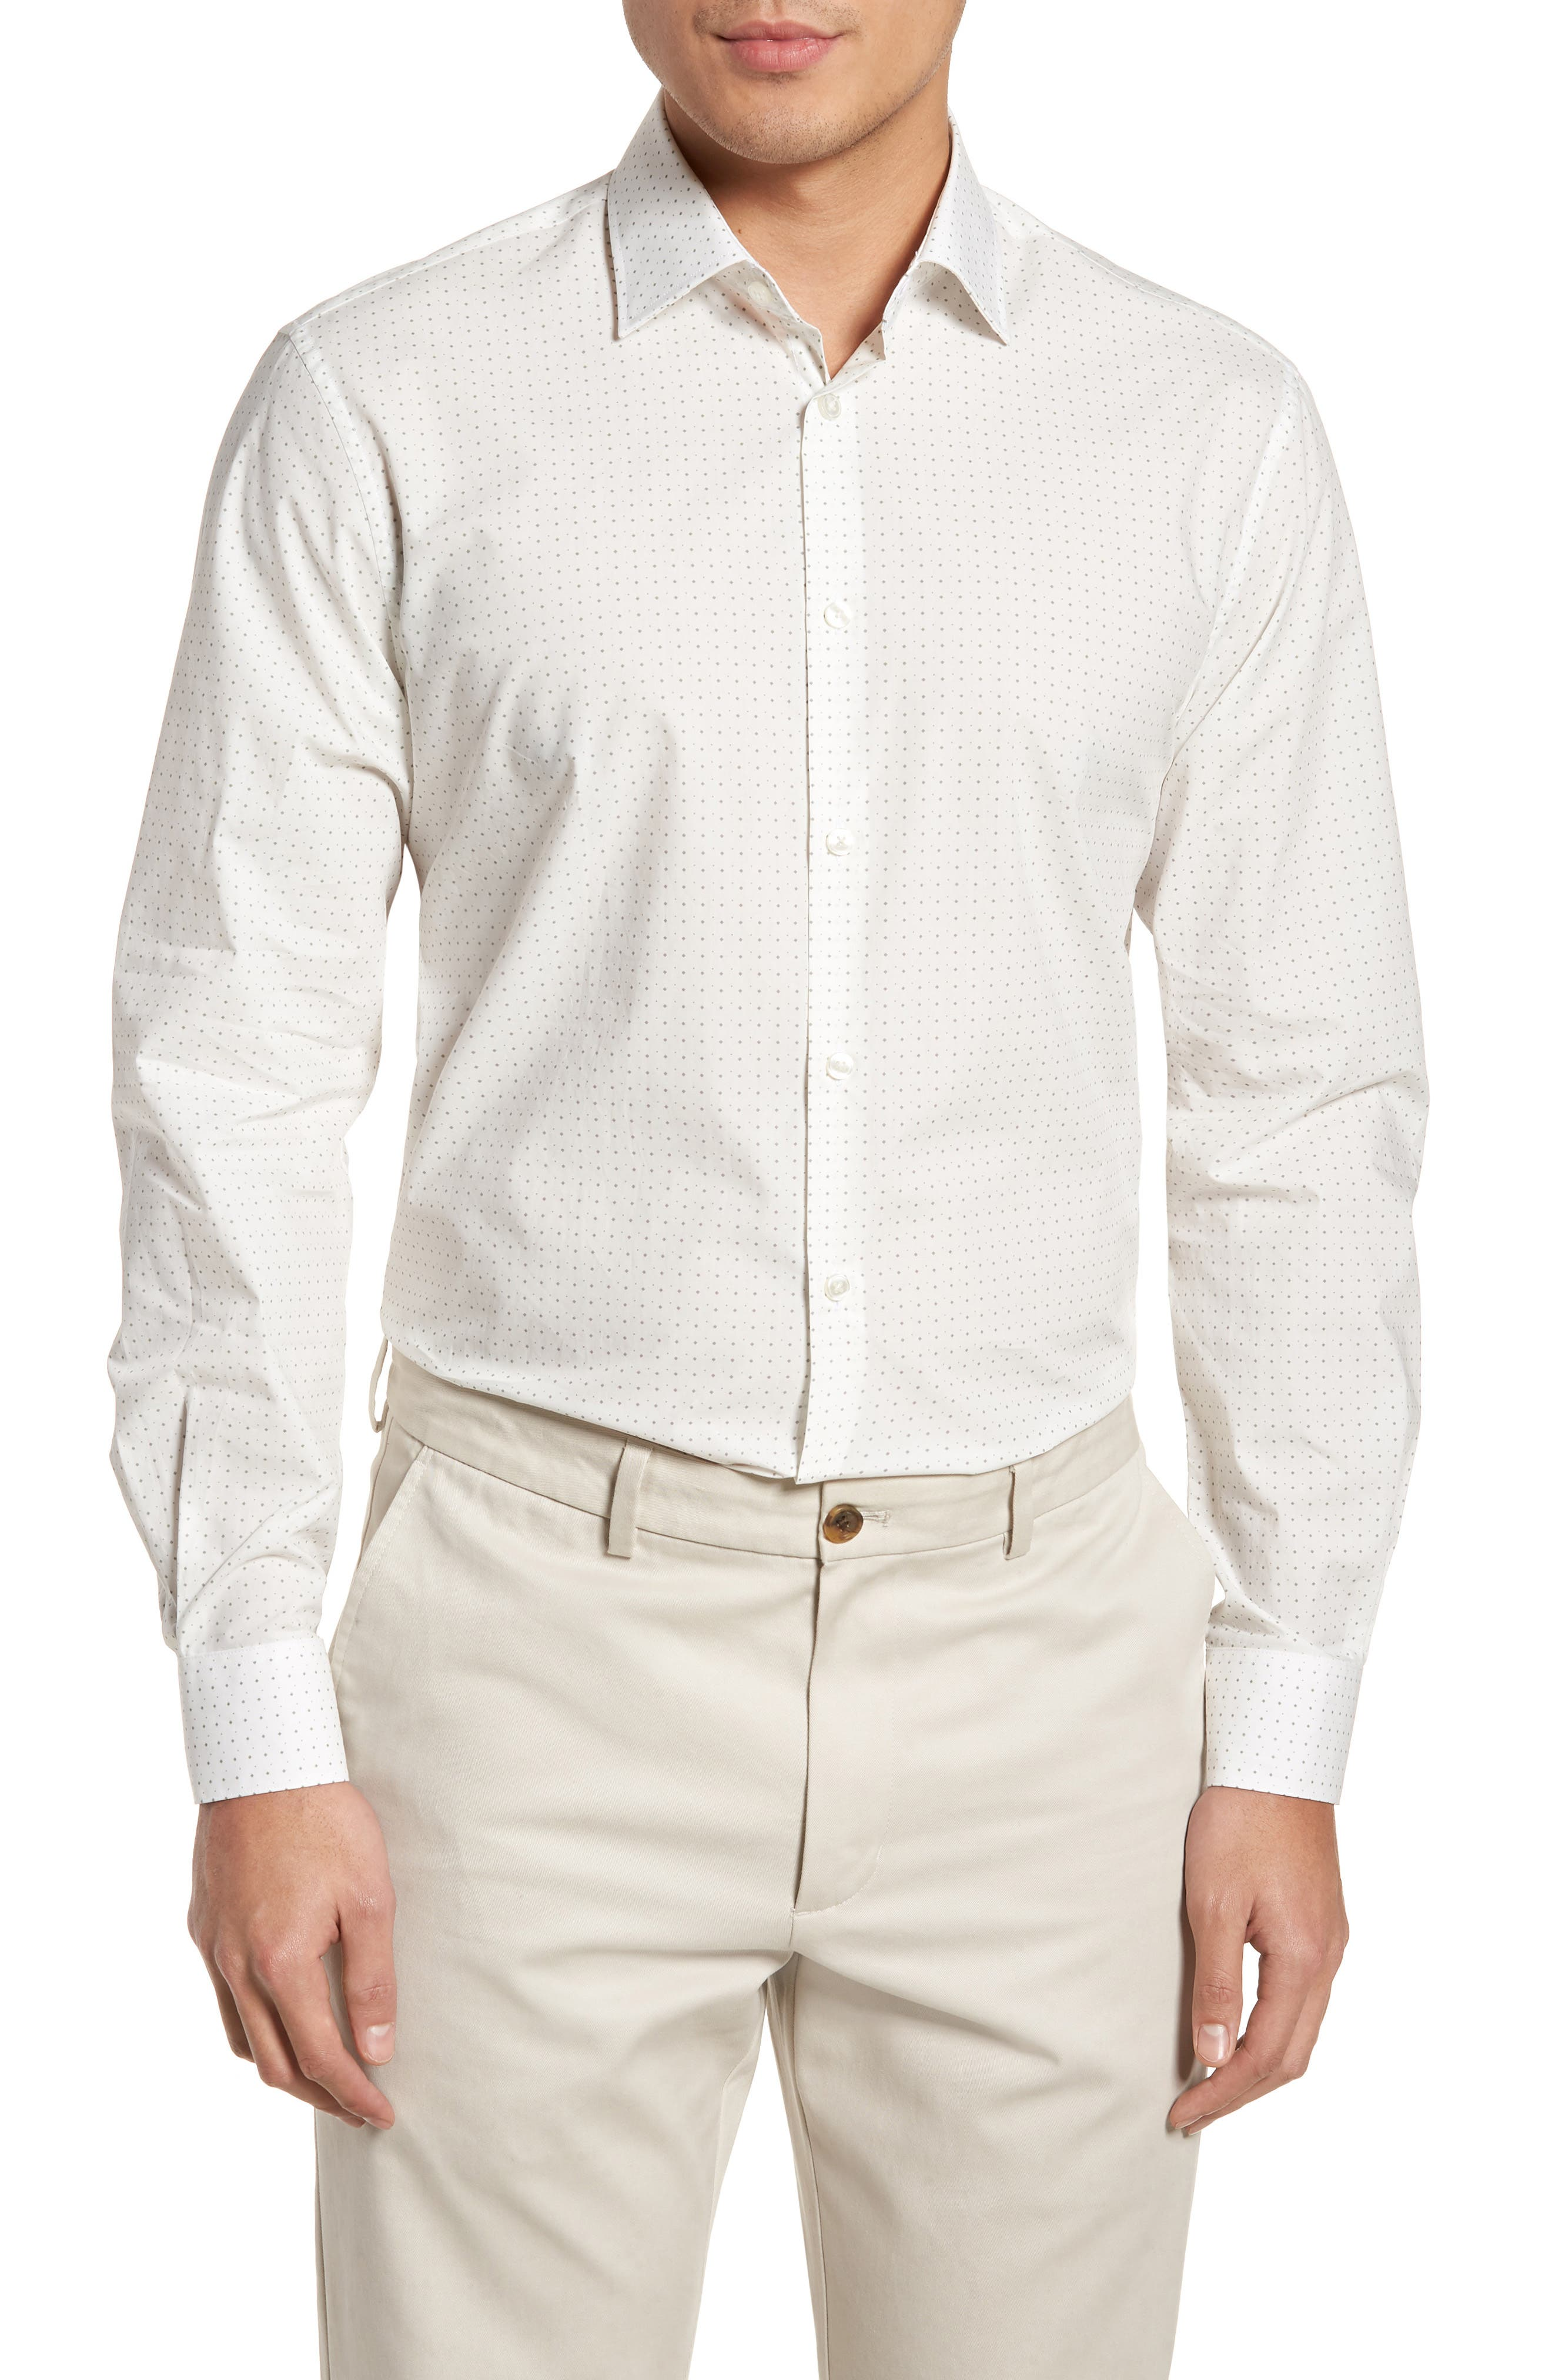 Regular Fit Diamond Dress Shirt,                             Main thumbnail 1, color,                             077